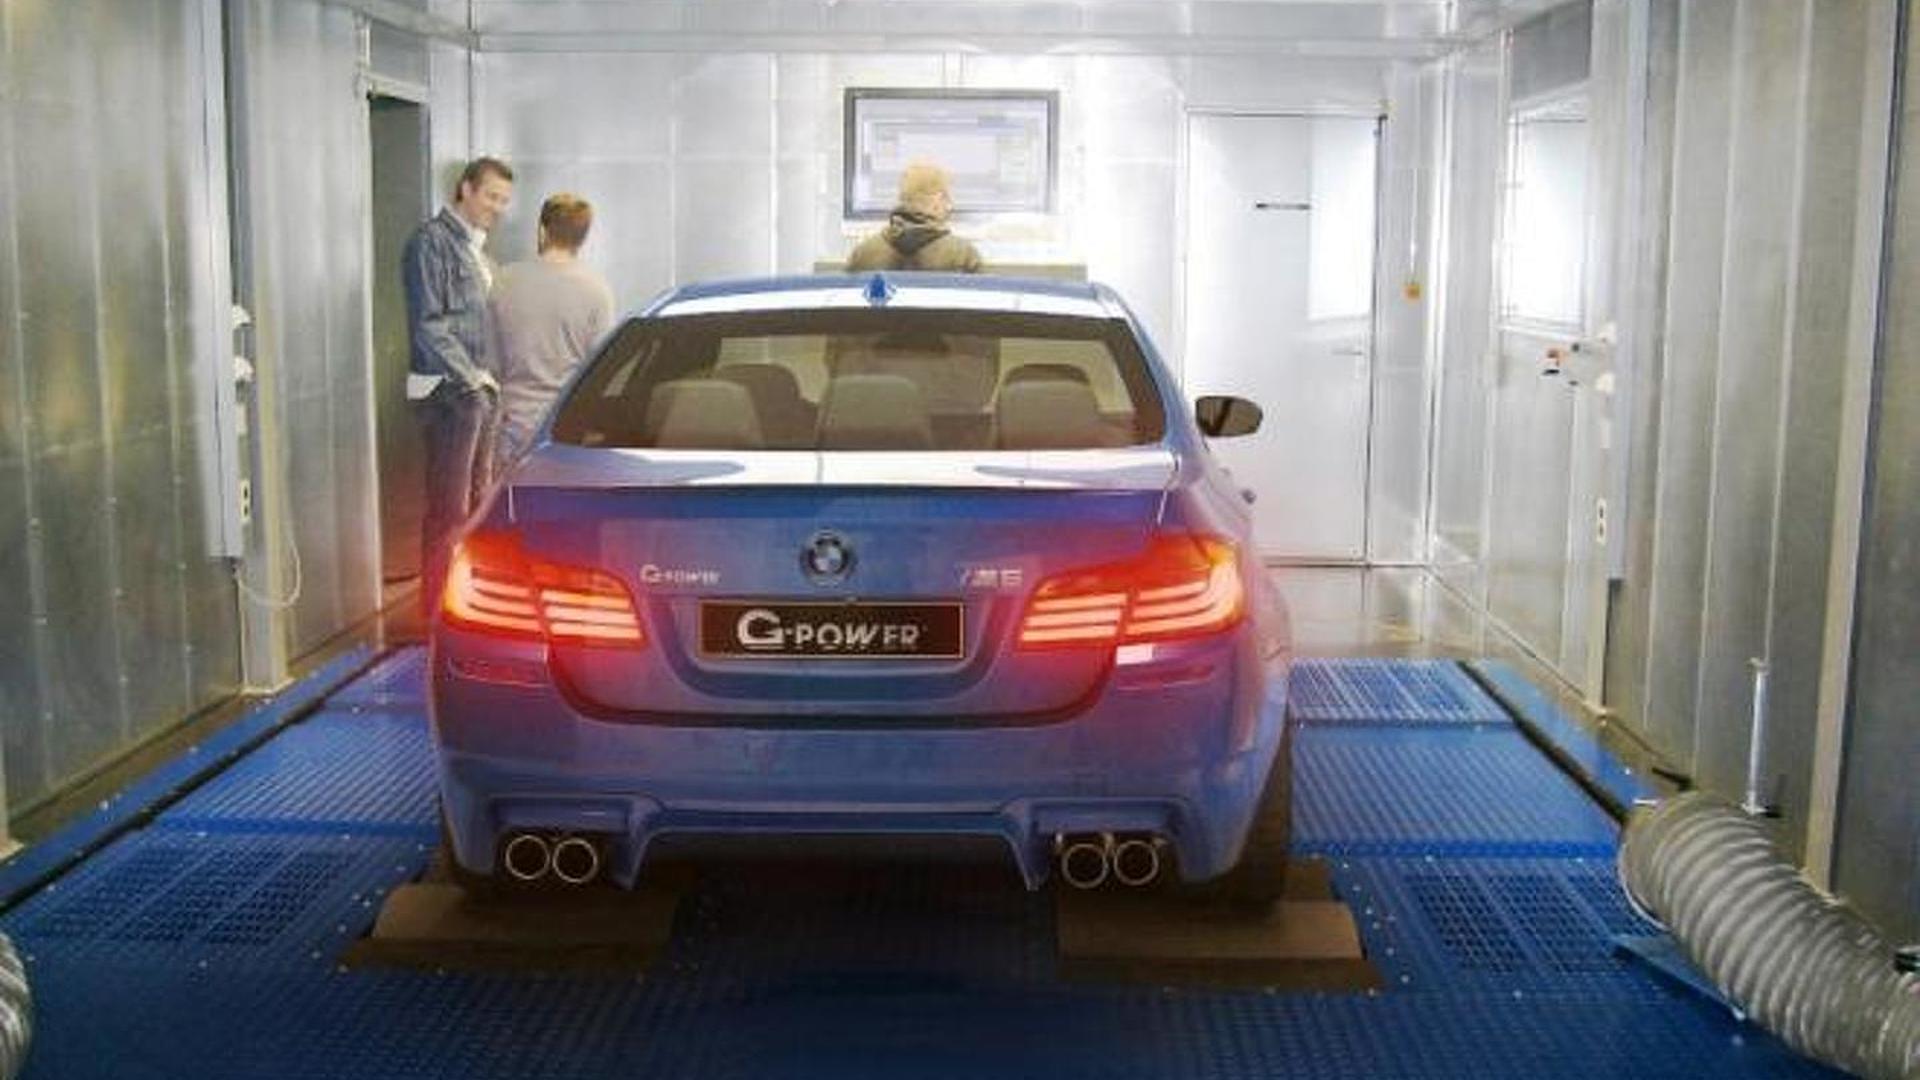 G-Power teases BMW M5 F10 tuning program